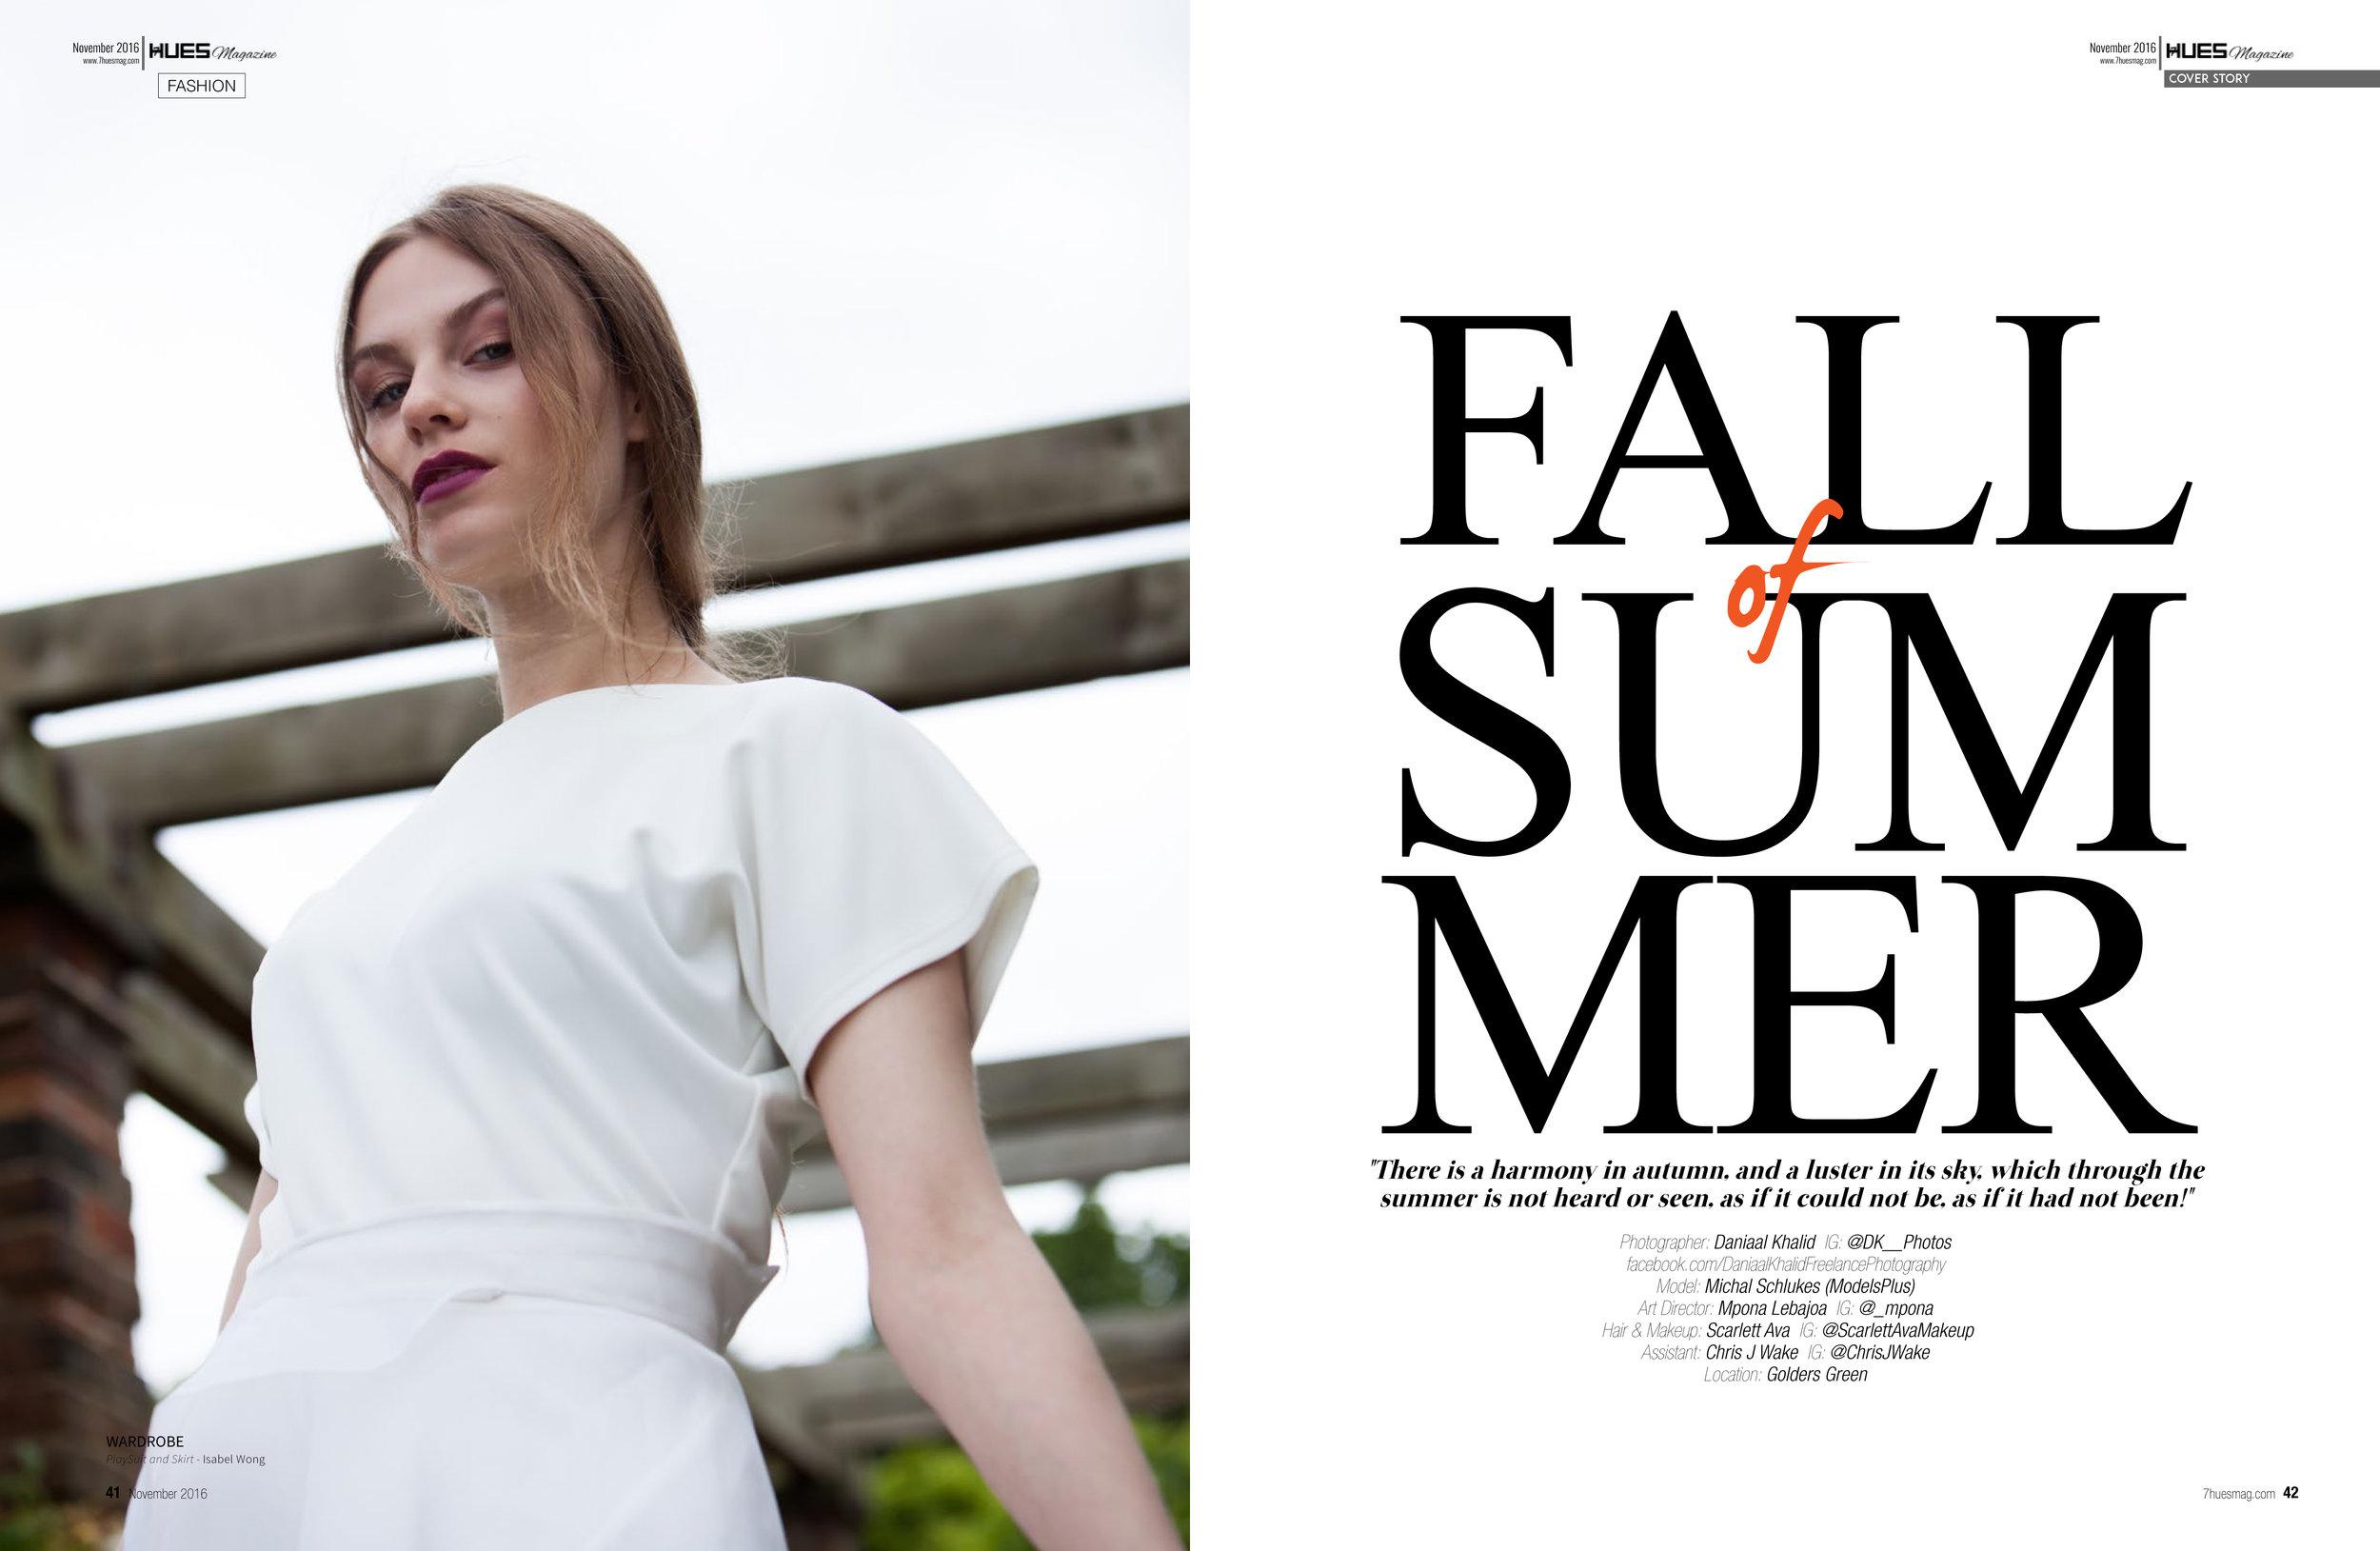 Fall of Summer Tears-1.jpg